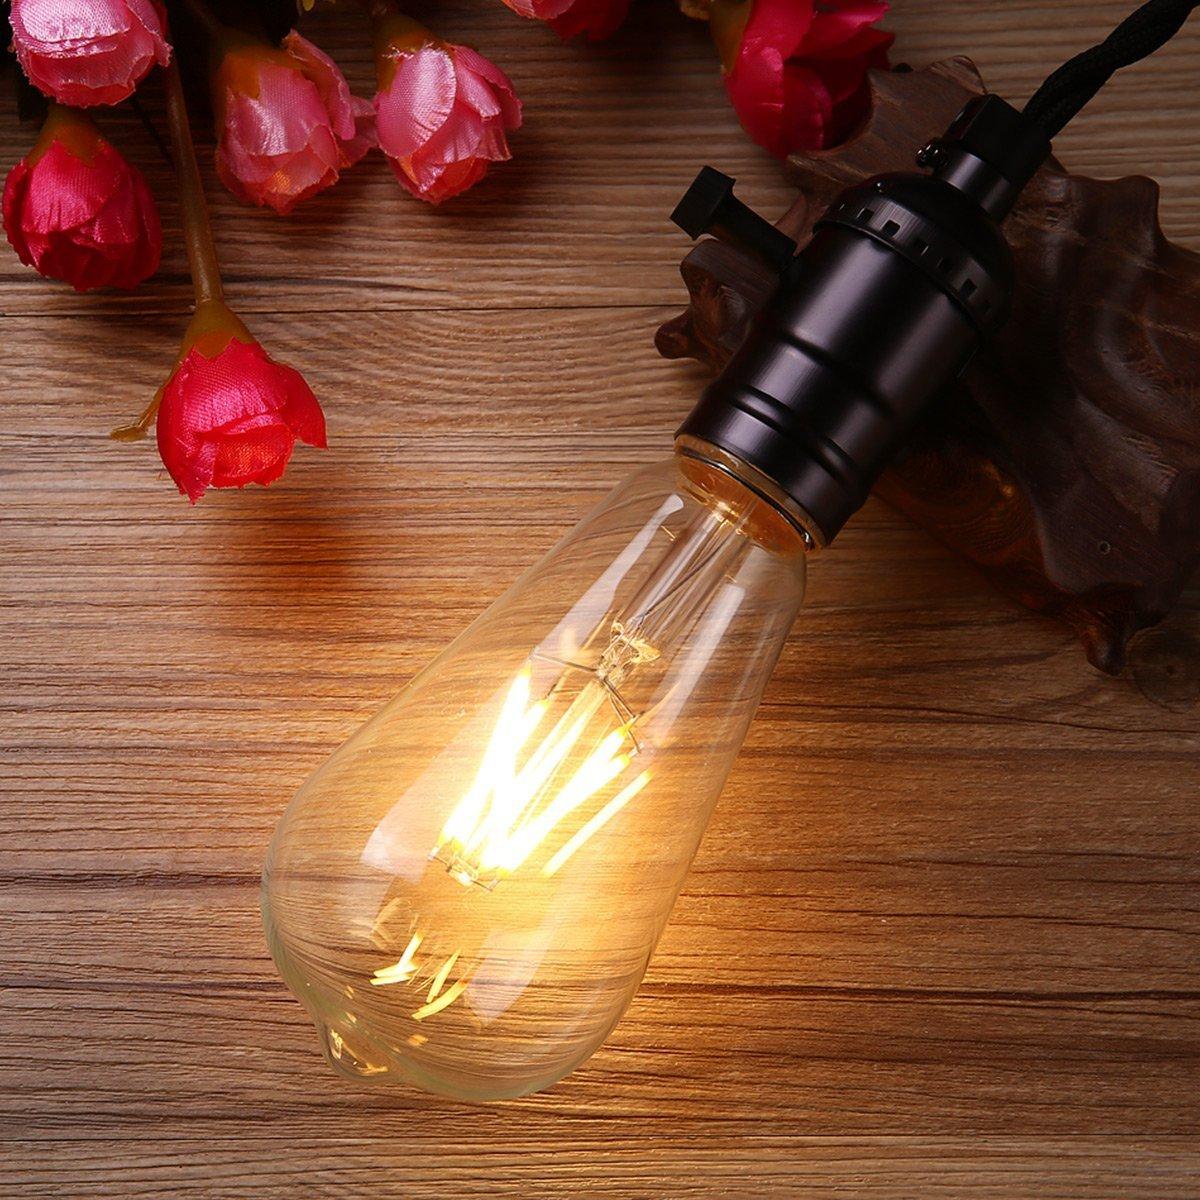 KINGSO LED Edison Retro Gl/ühbirne 4W E27 Birne 4 hartes Faden Filament ST64 Vintage Eichh/örnchen K/äfig Gl/ühbirnen Beleuchtung Warmwei/ß Dimmbare 220V 6 Pack